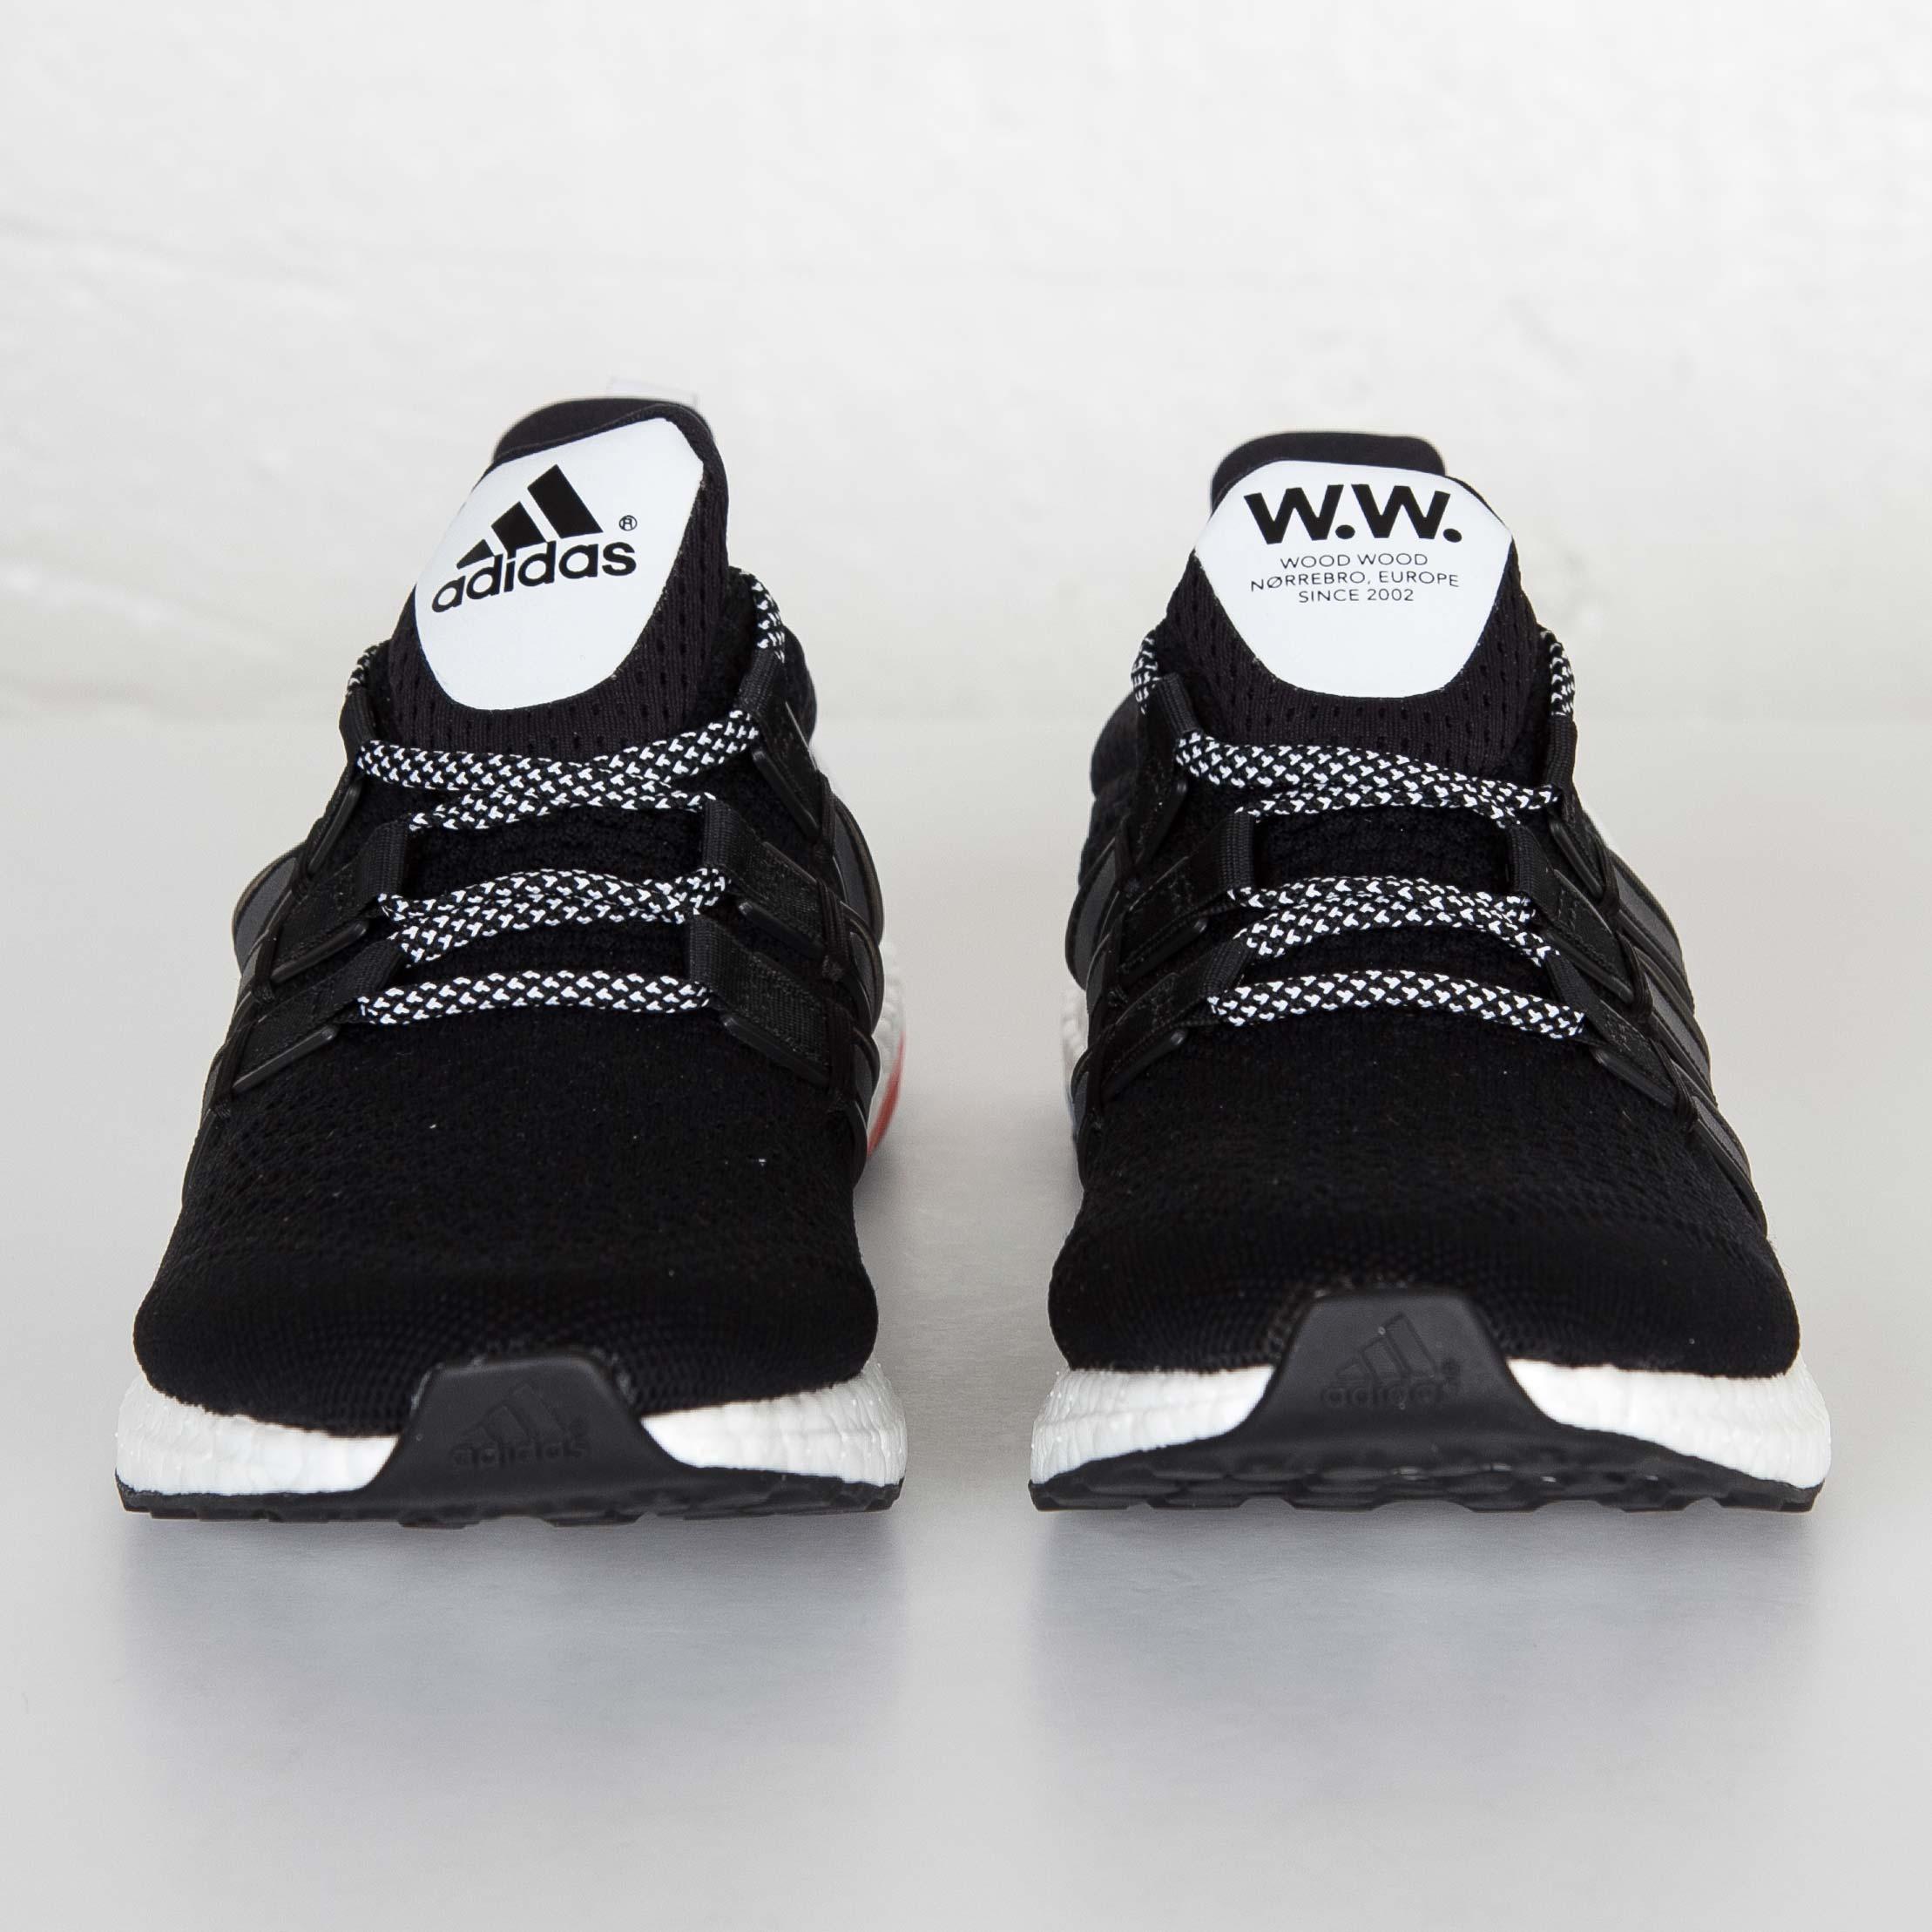 2b64efec794 adidas ultraboost m - Af5778 - Sneakersnstuff